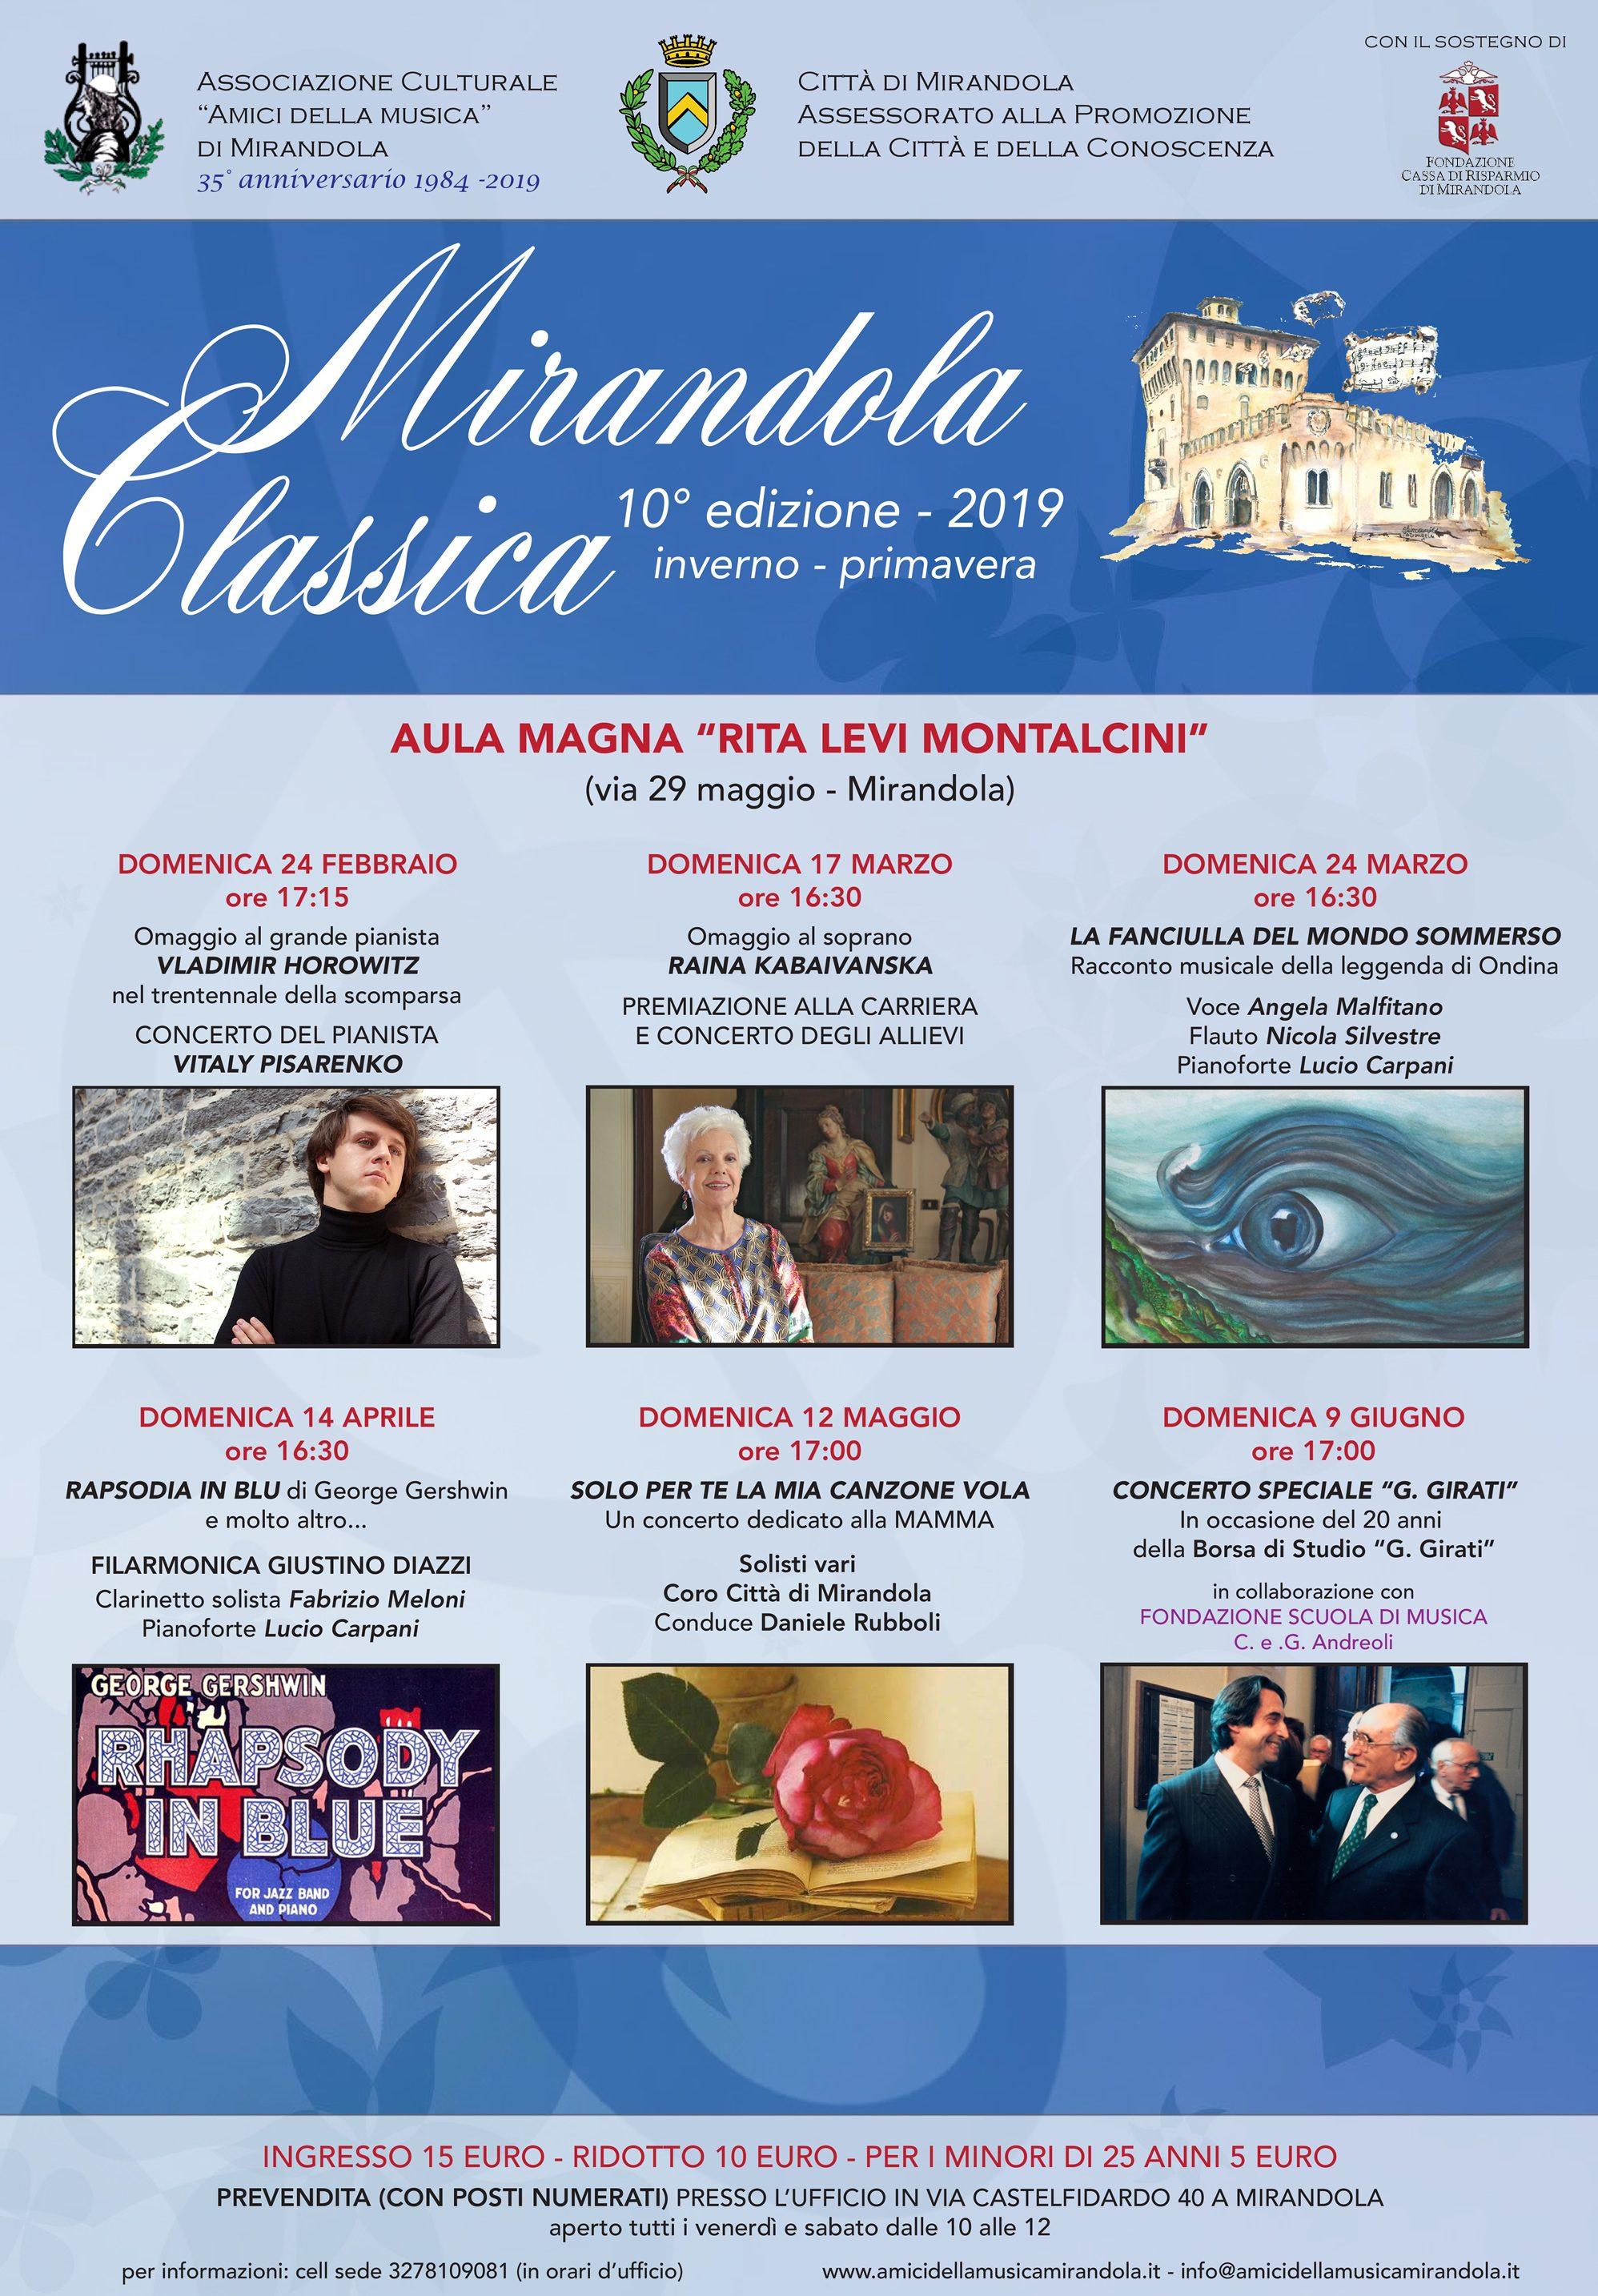 """Mirandola Classica"" – 10° edizione 2019. L'Associazione Culturale compie 35 anni di vita"